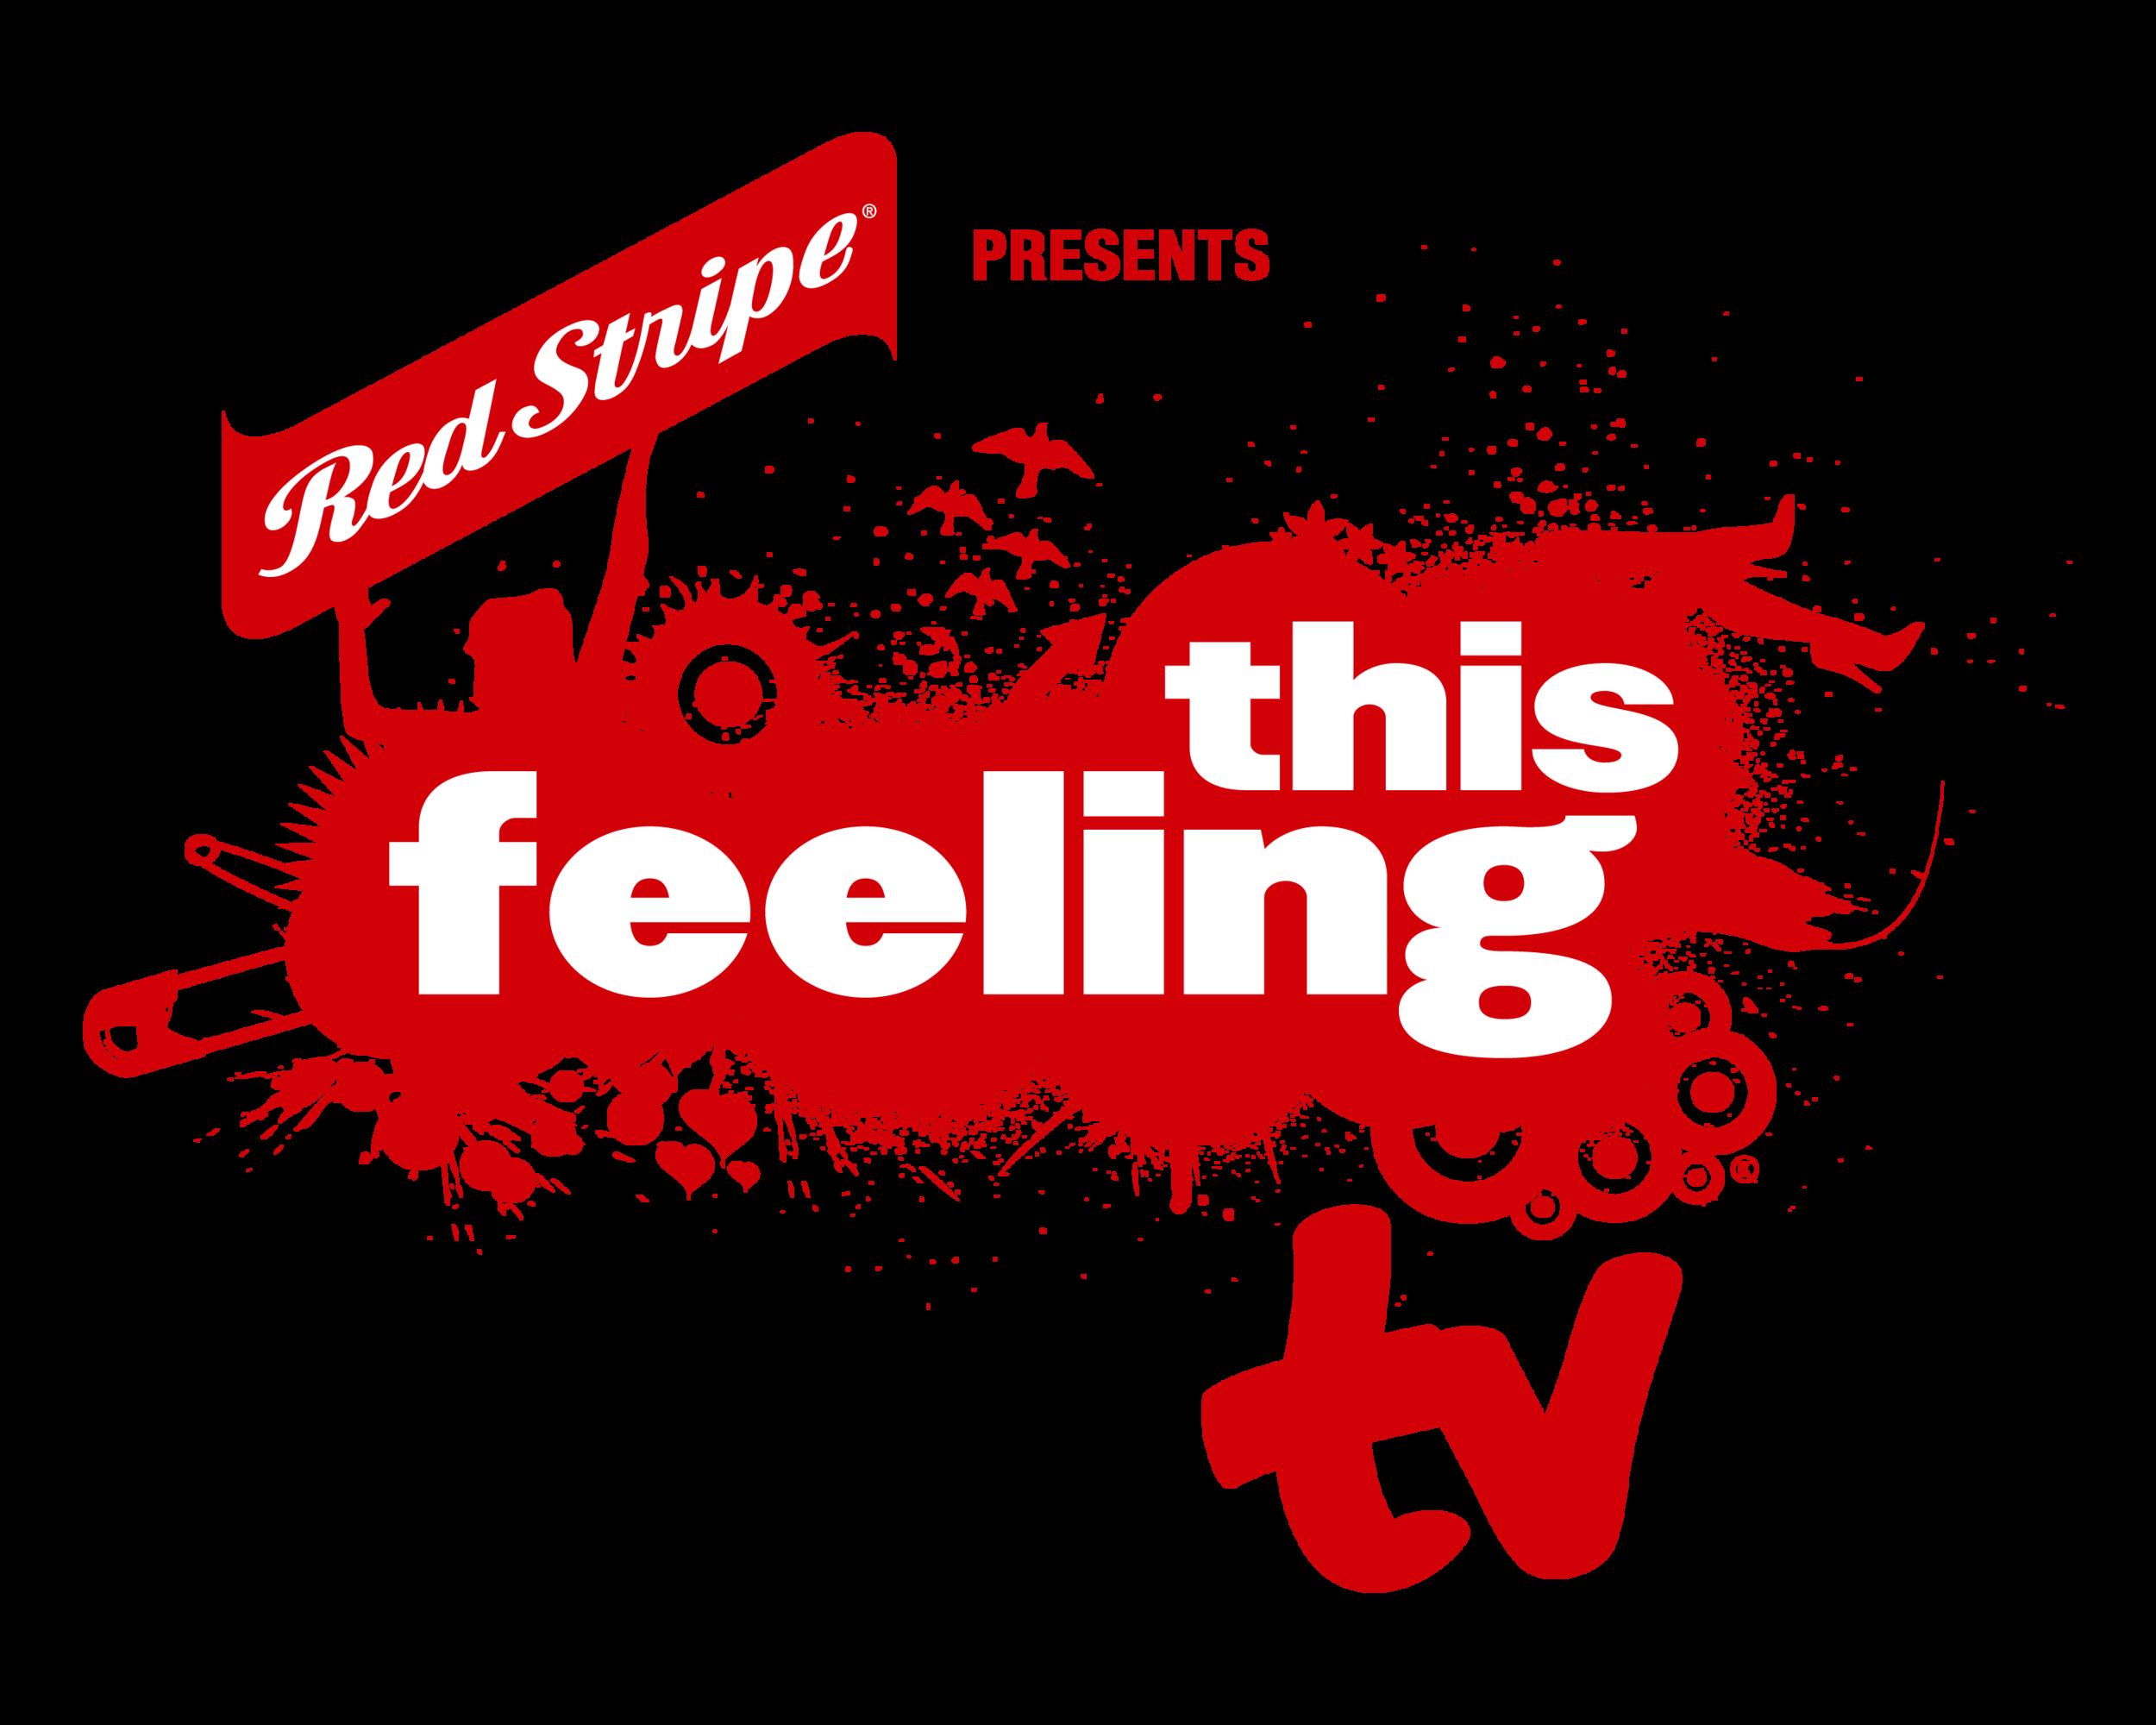 TF_TV_RedStripe_RGB_Red.png